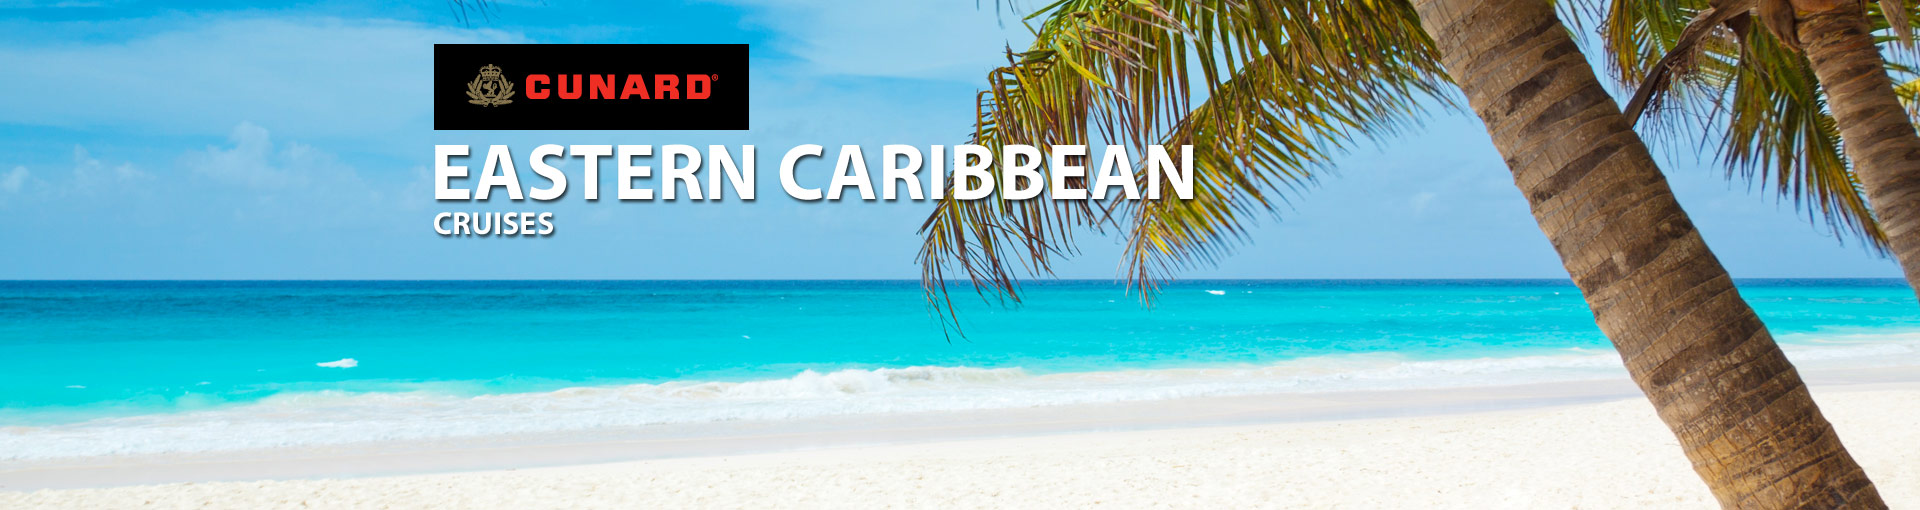 Cunard Line Eastern Caribbean Cruises